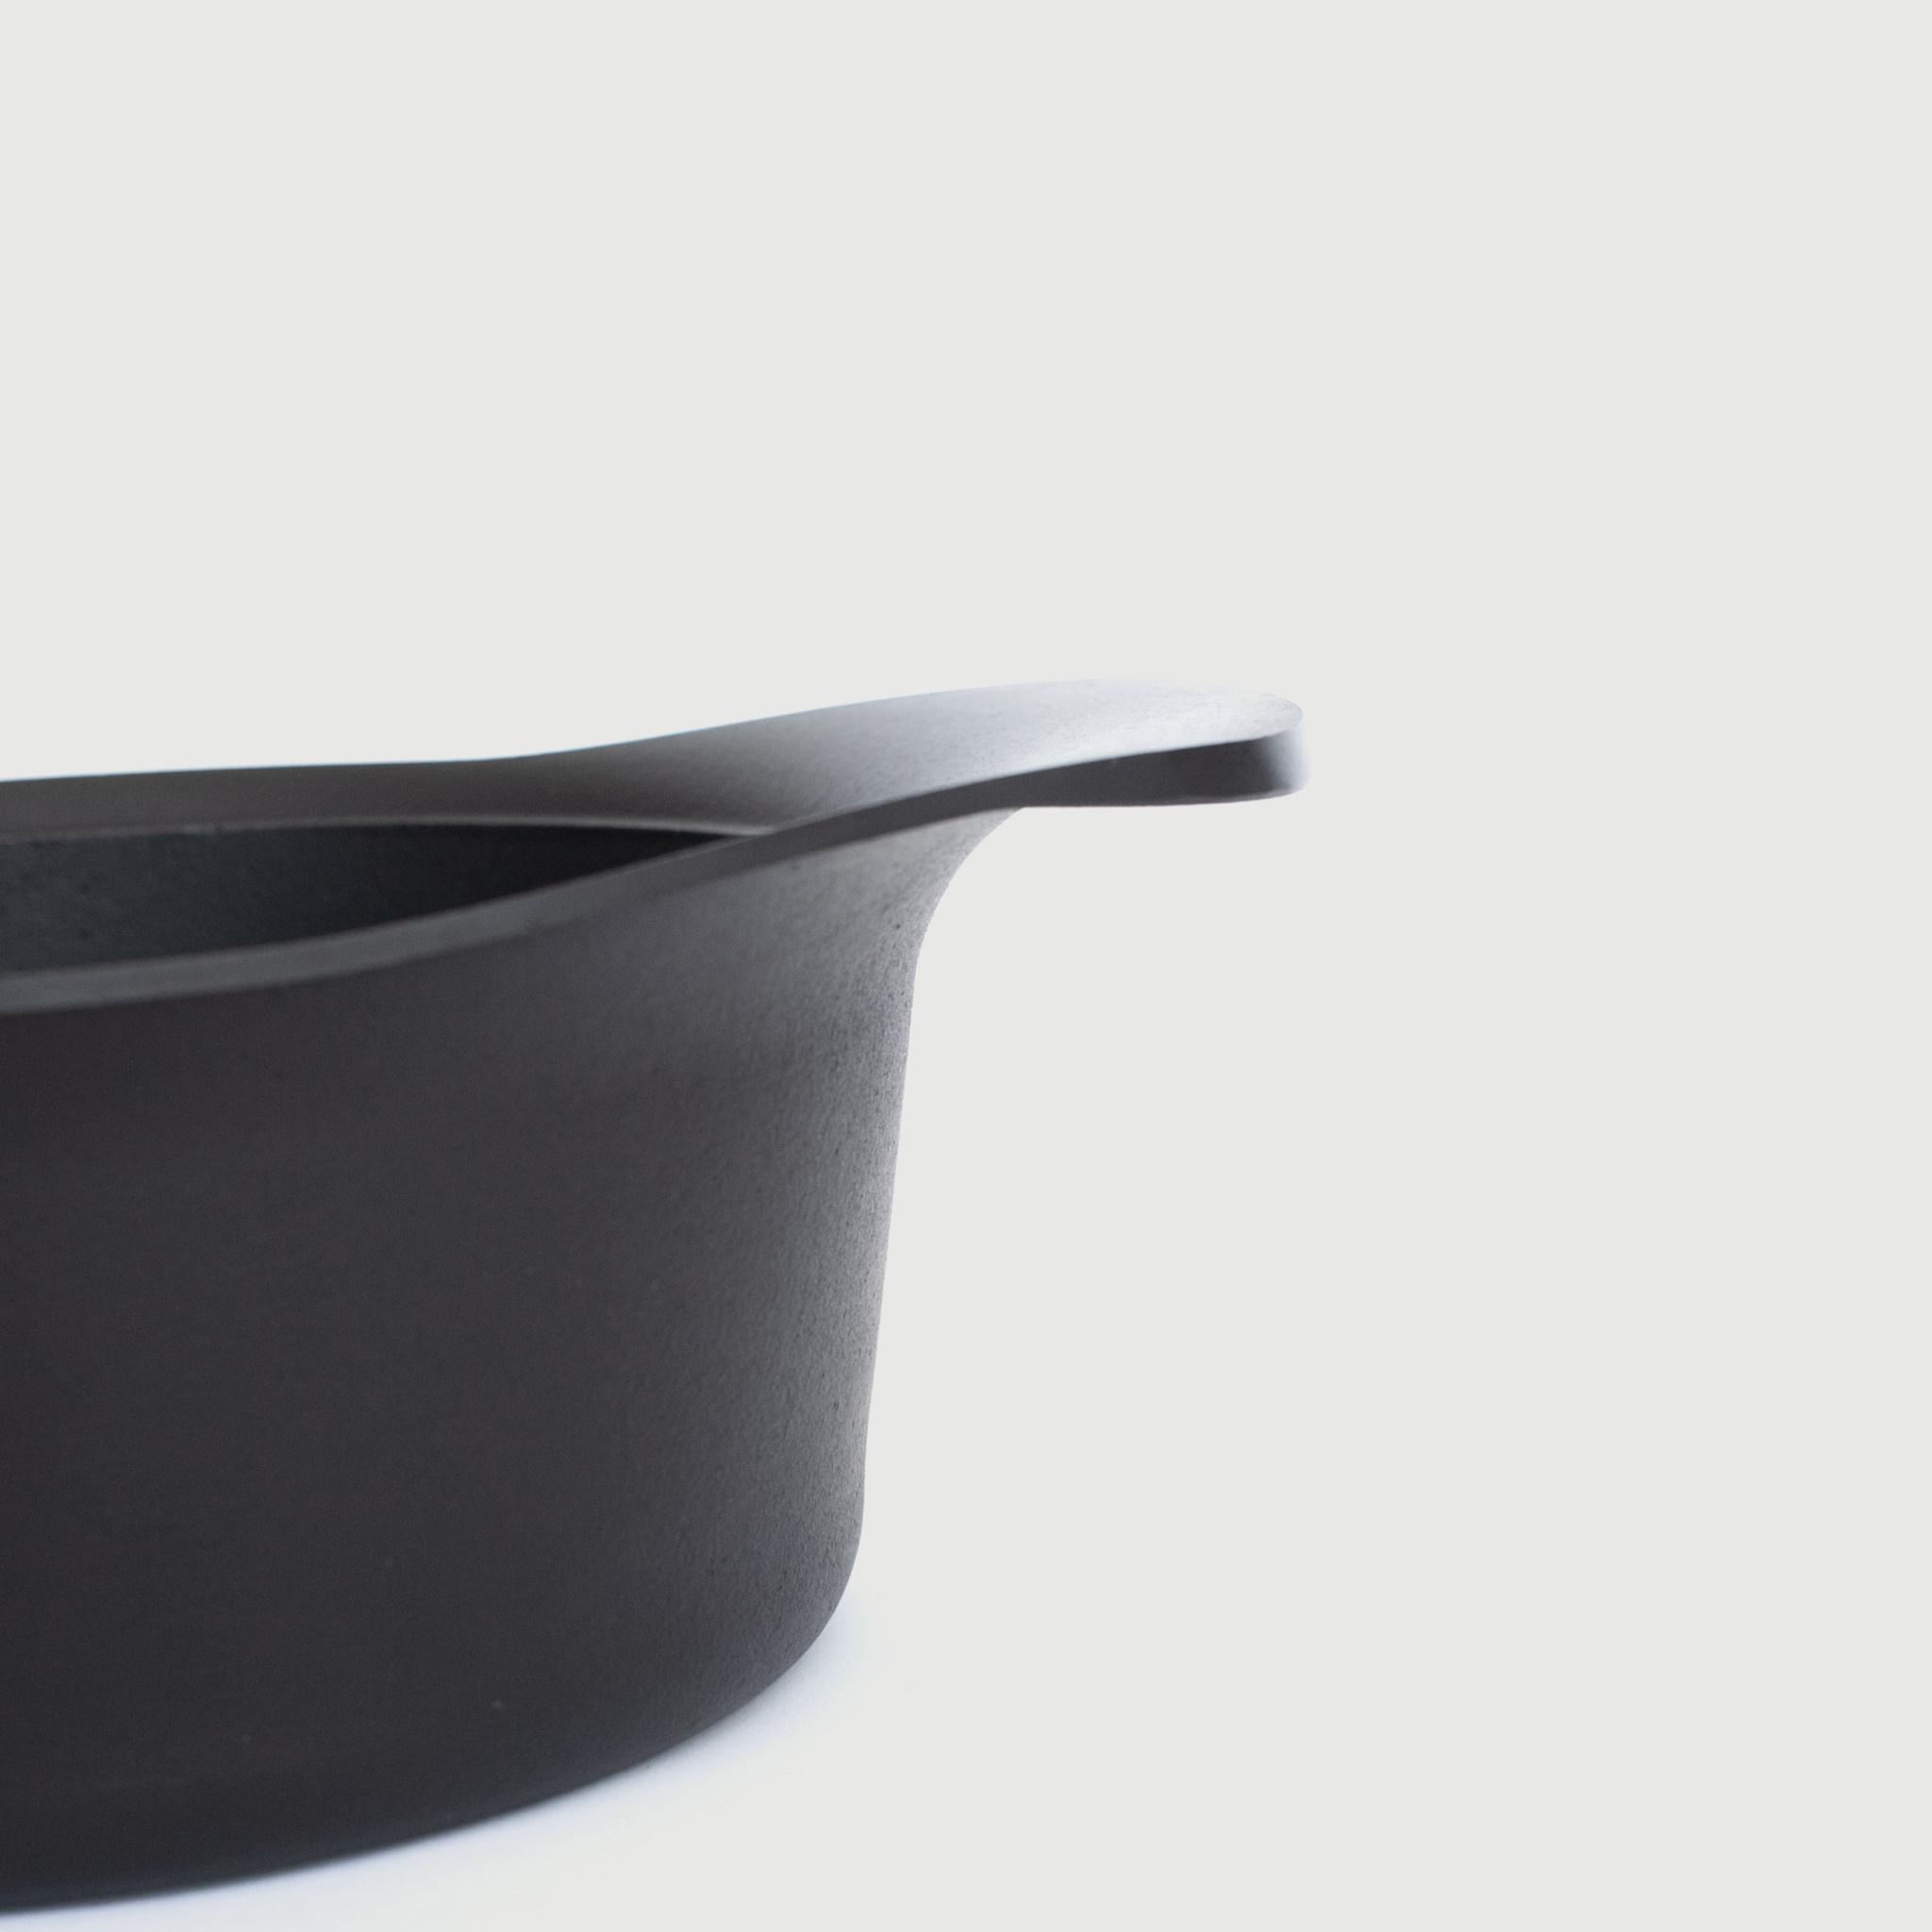 Sori Yanagi Sori Yanagi, Tekki Cast Iron Deep Pan with Lid and Handle, 22cm